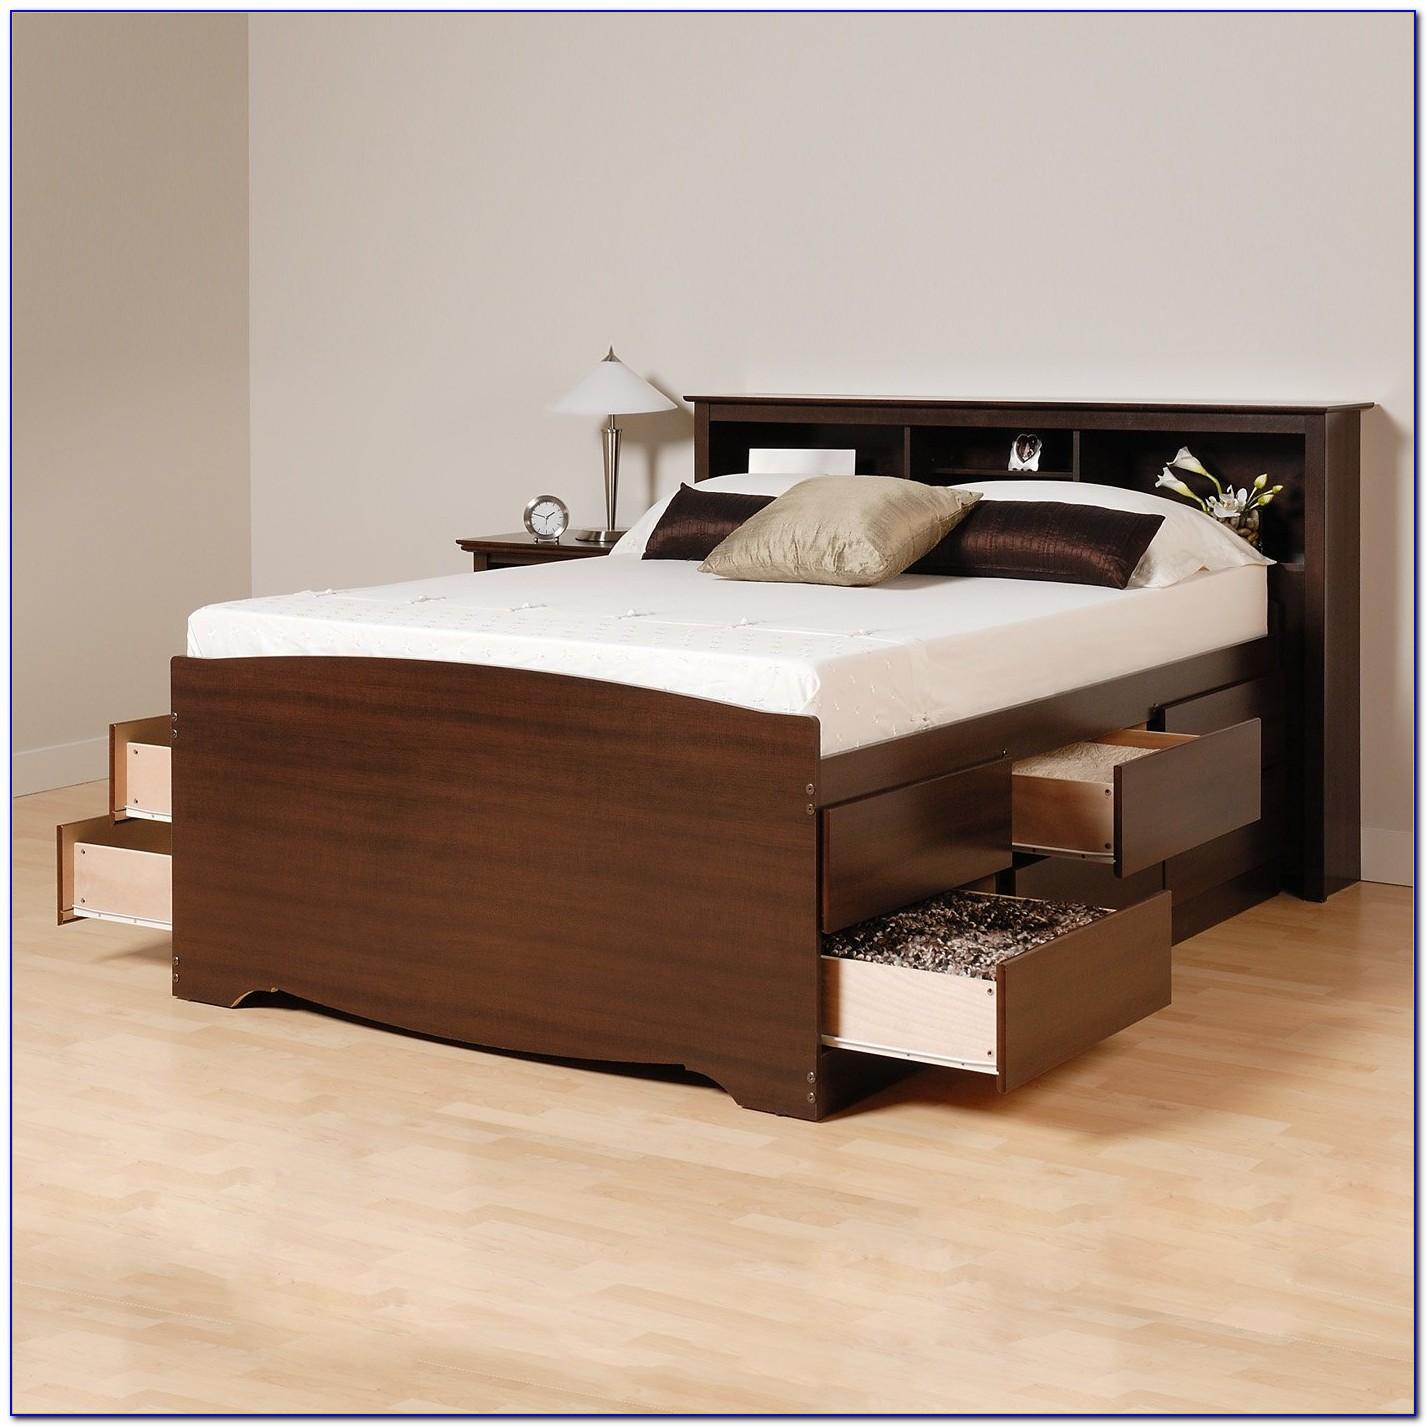 Solana Platform Bed With Bookcase Headboard